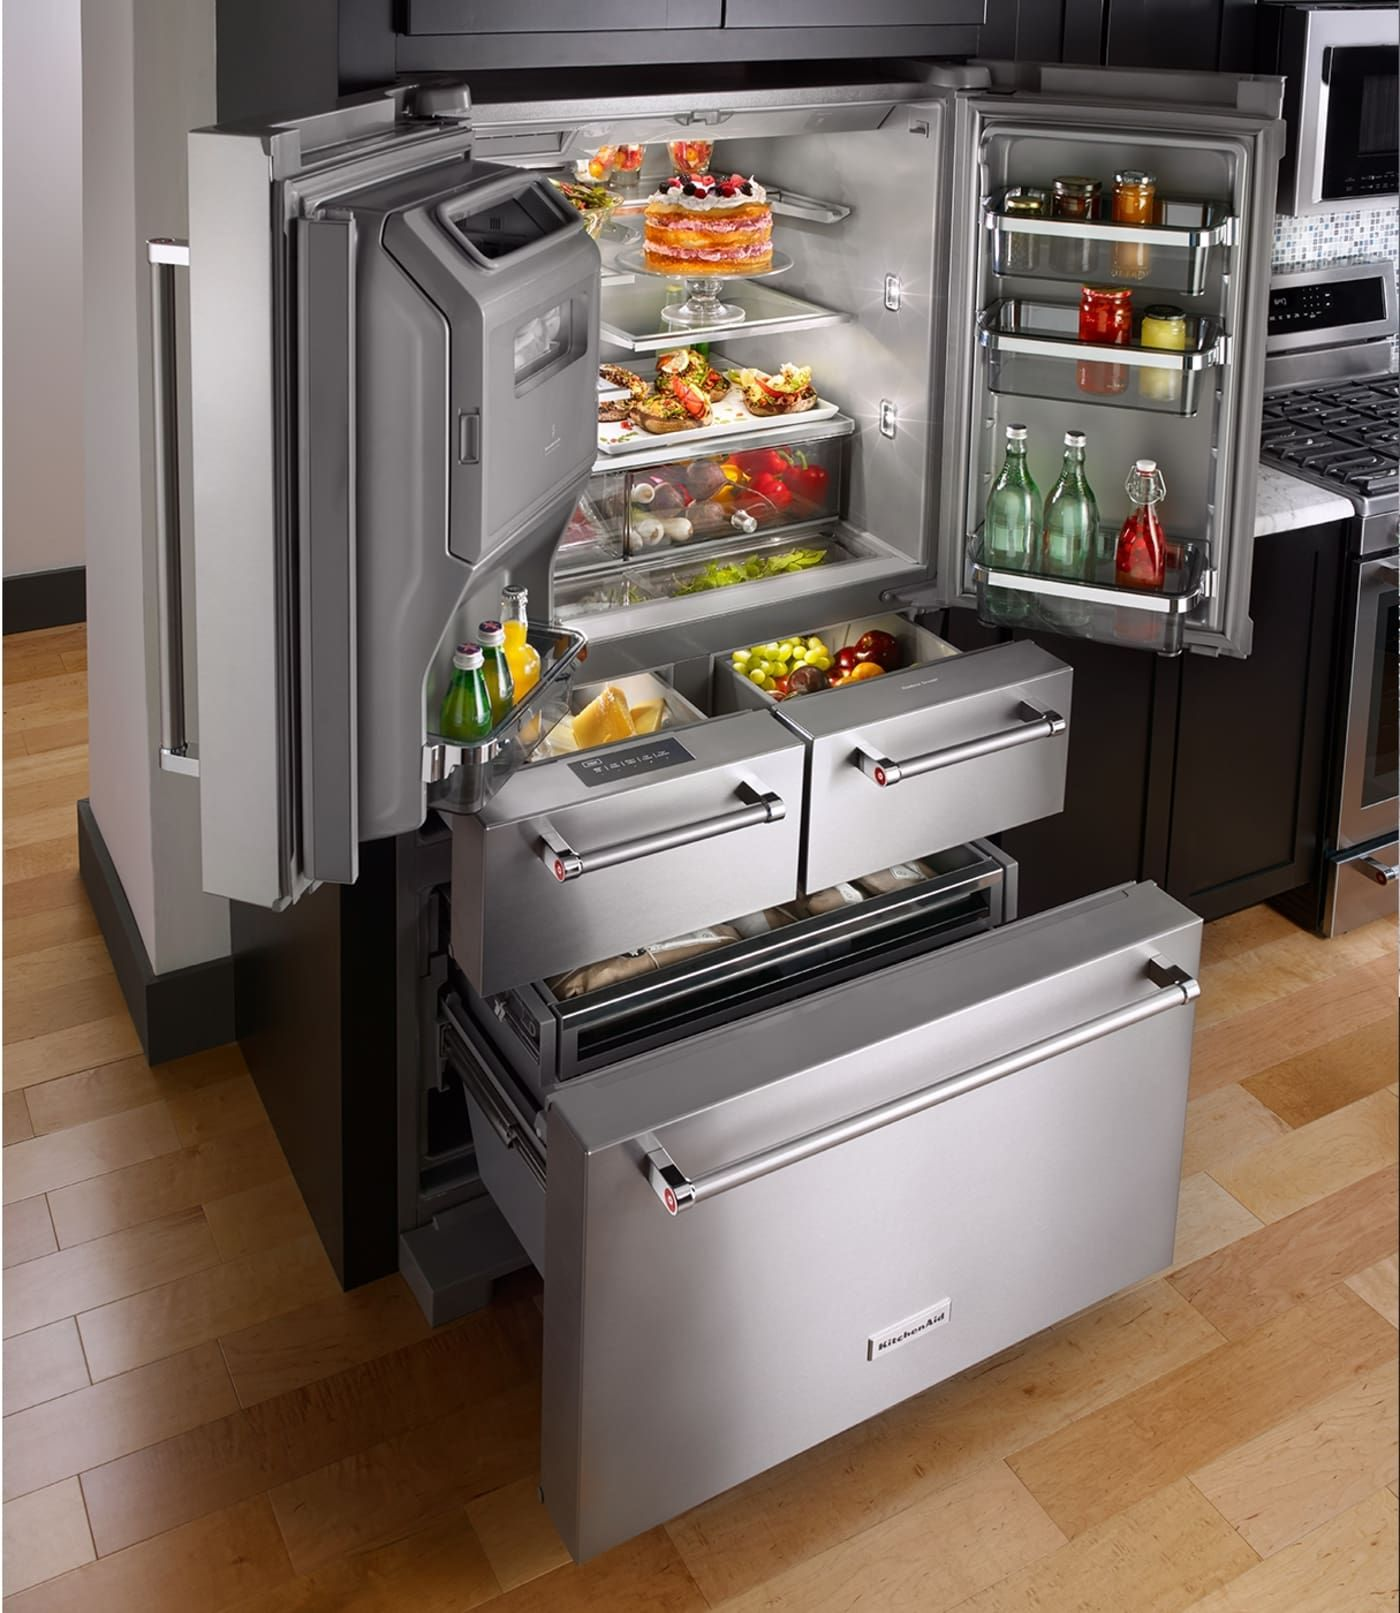 Krmf706ess By Kitchenaid French Door Refrigerators Goedekers Com Outdoor Kitchen Appliances Kitchen Renovation Kitchen Remodel